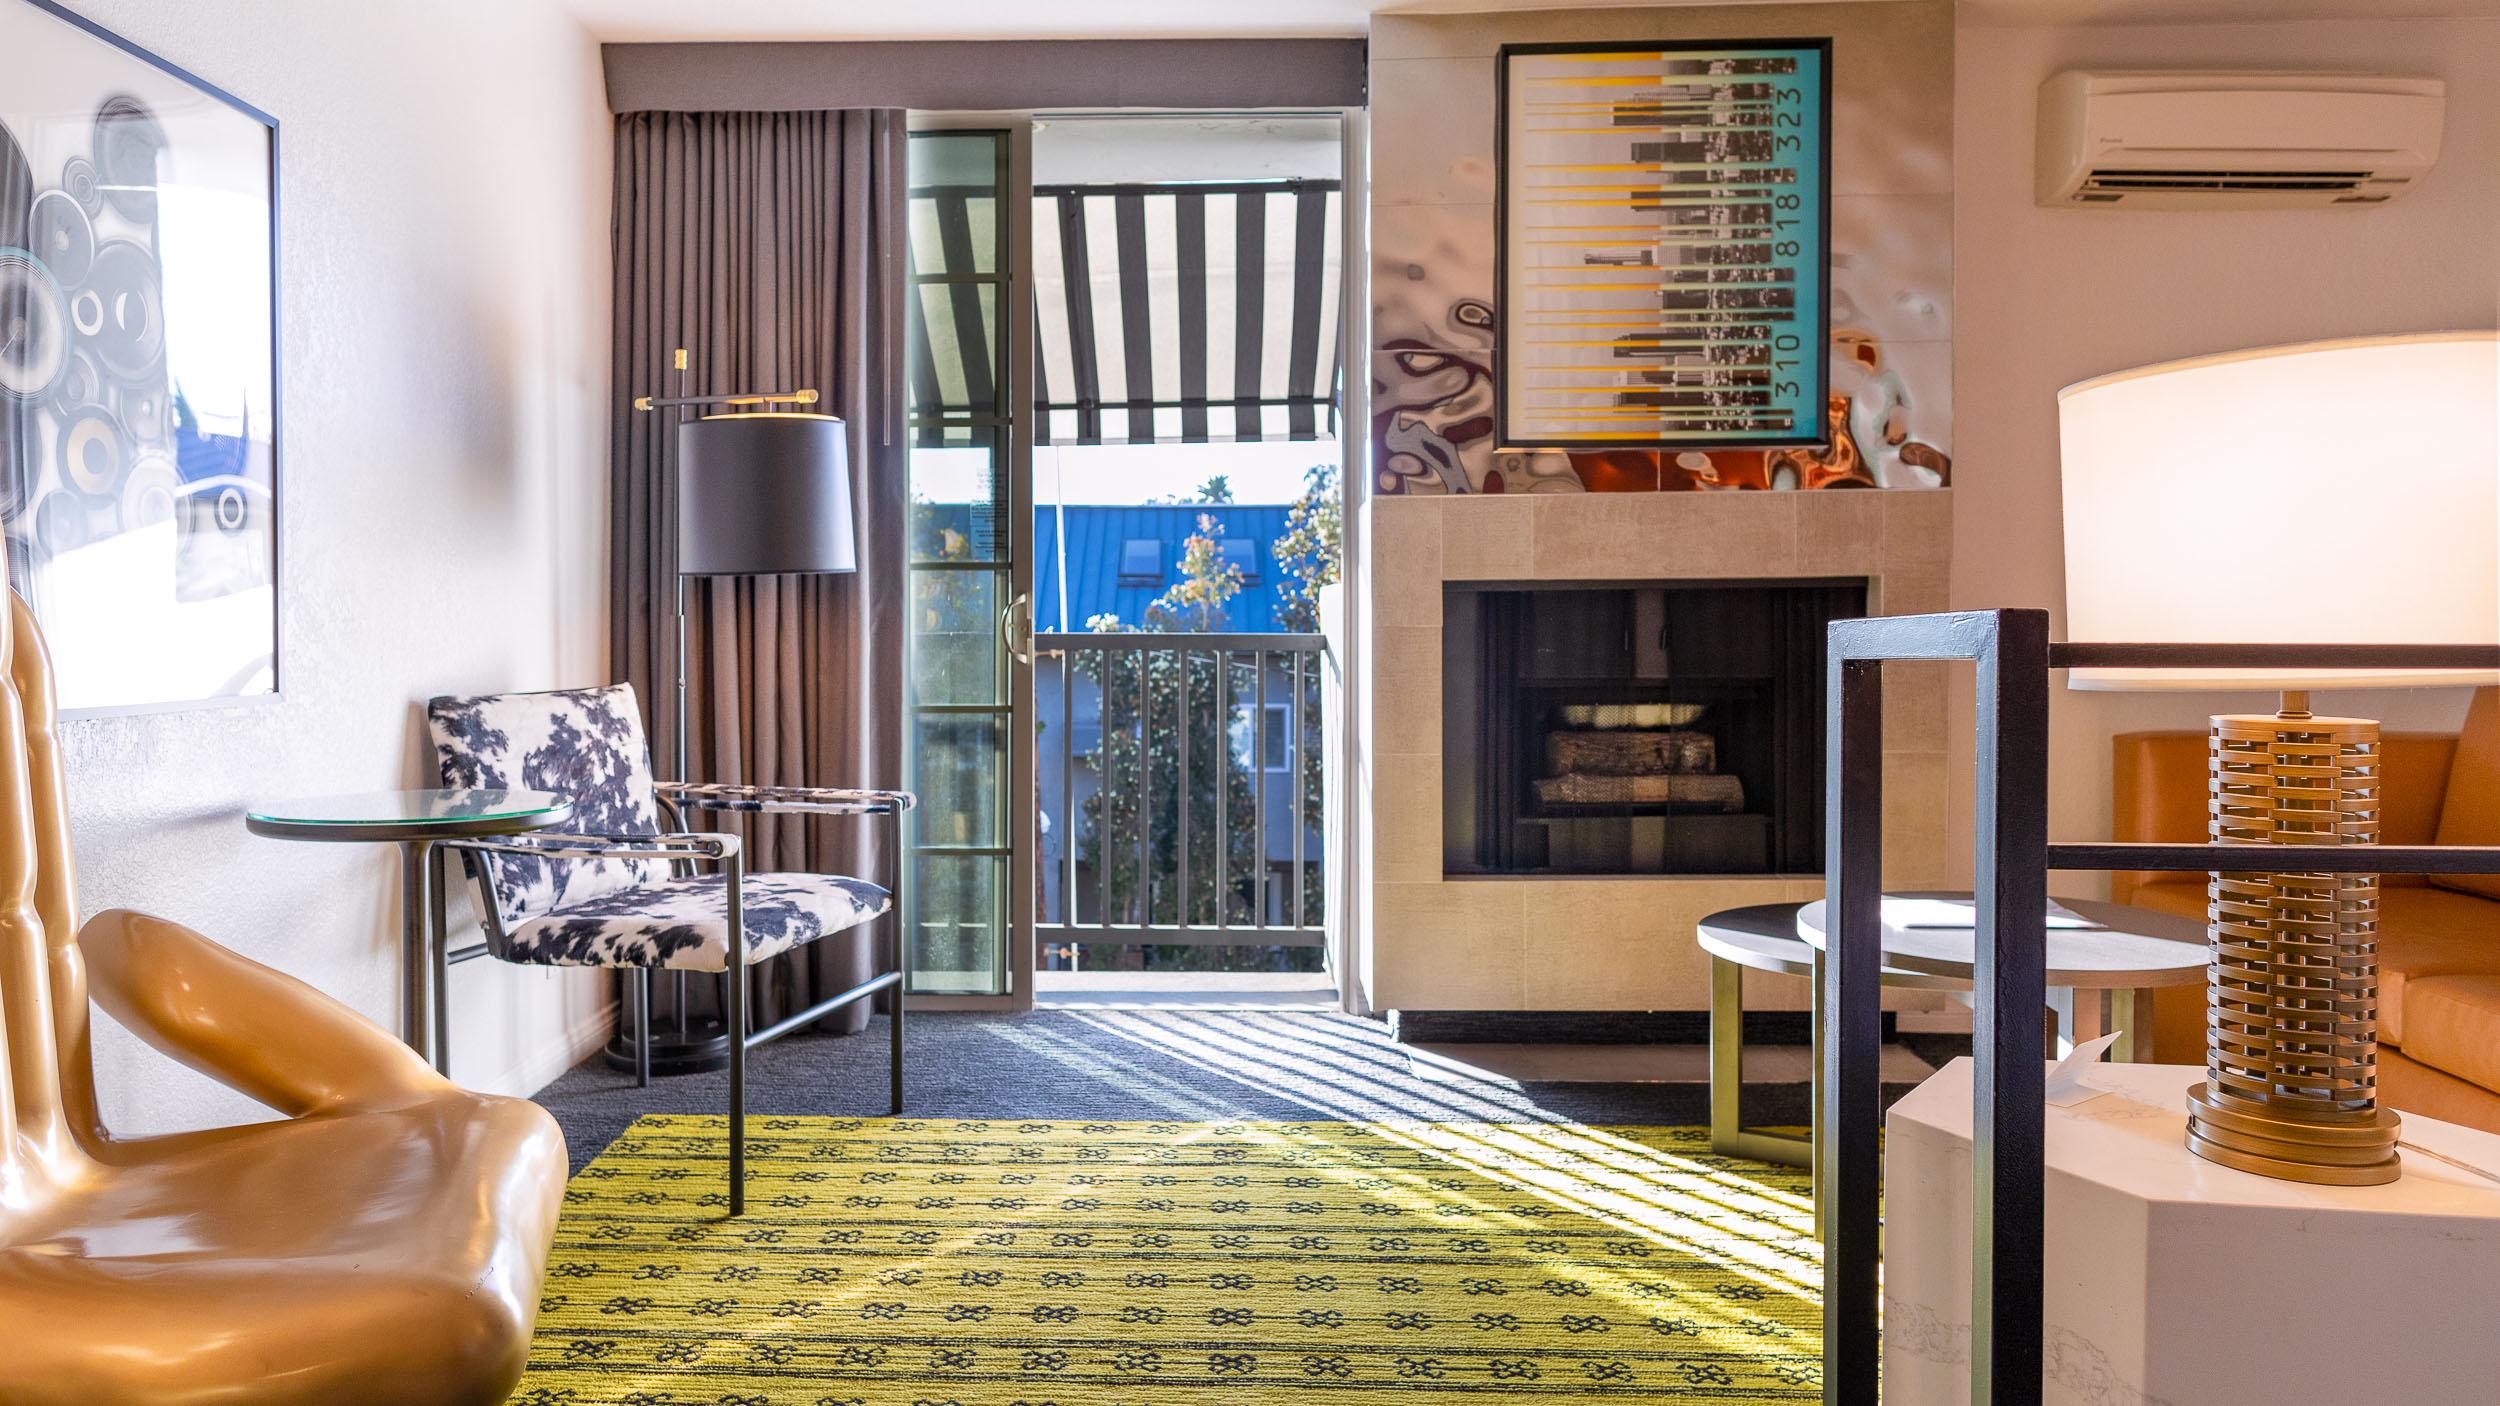 hospitality photography, hotel photography, interior photography